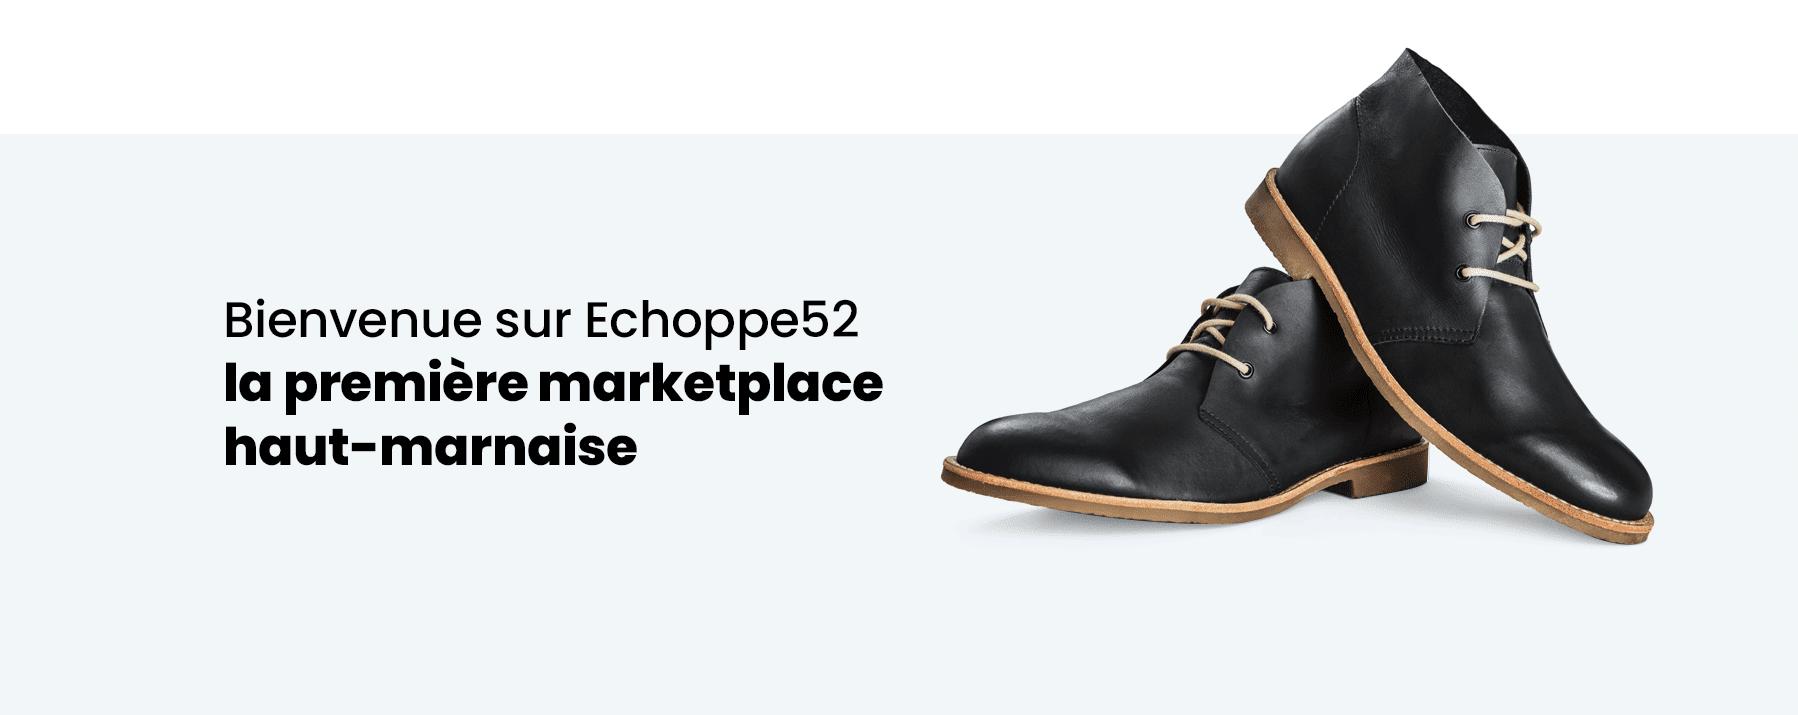 Echoppe52